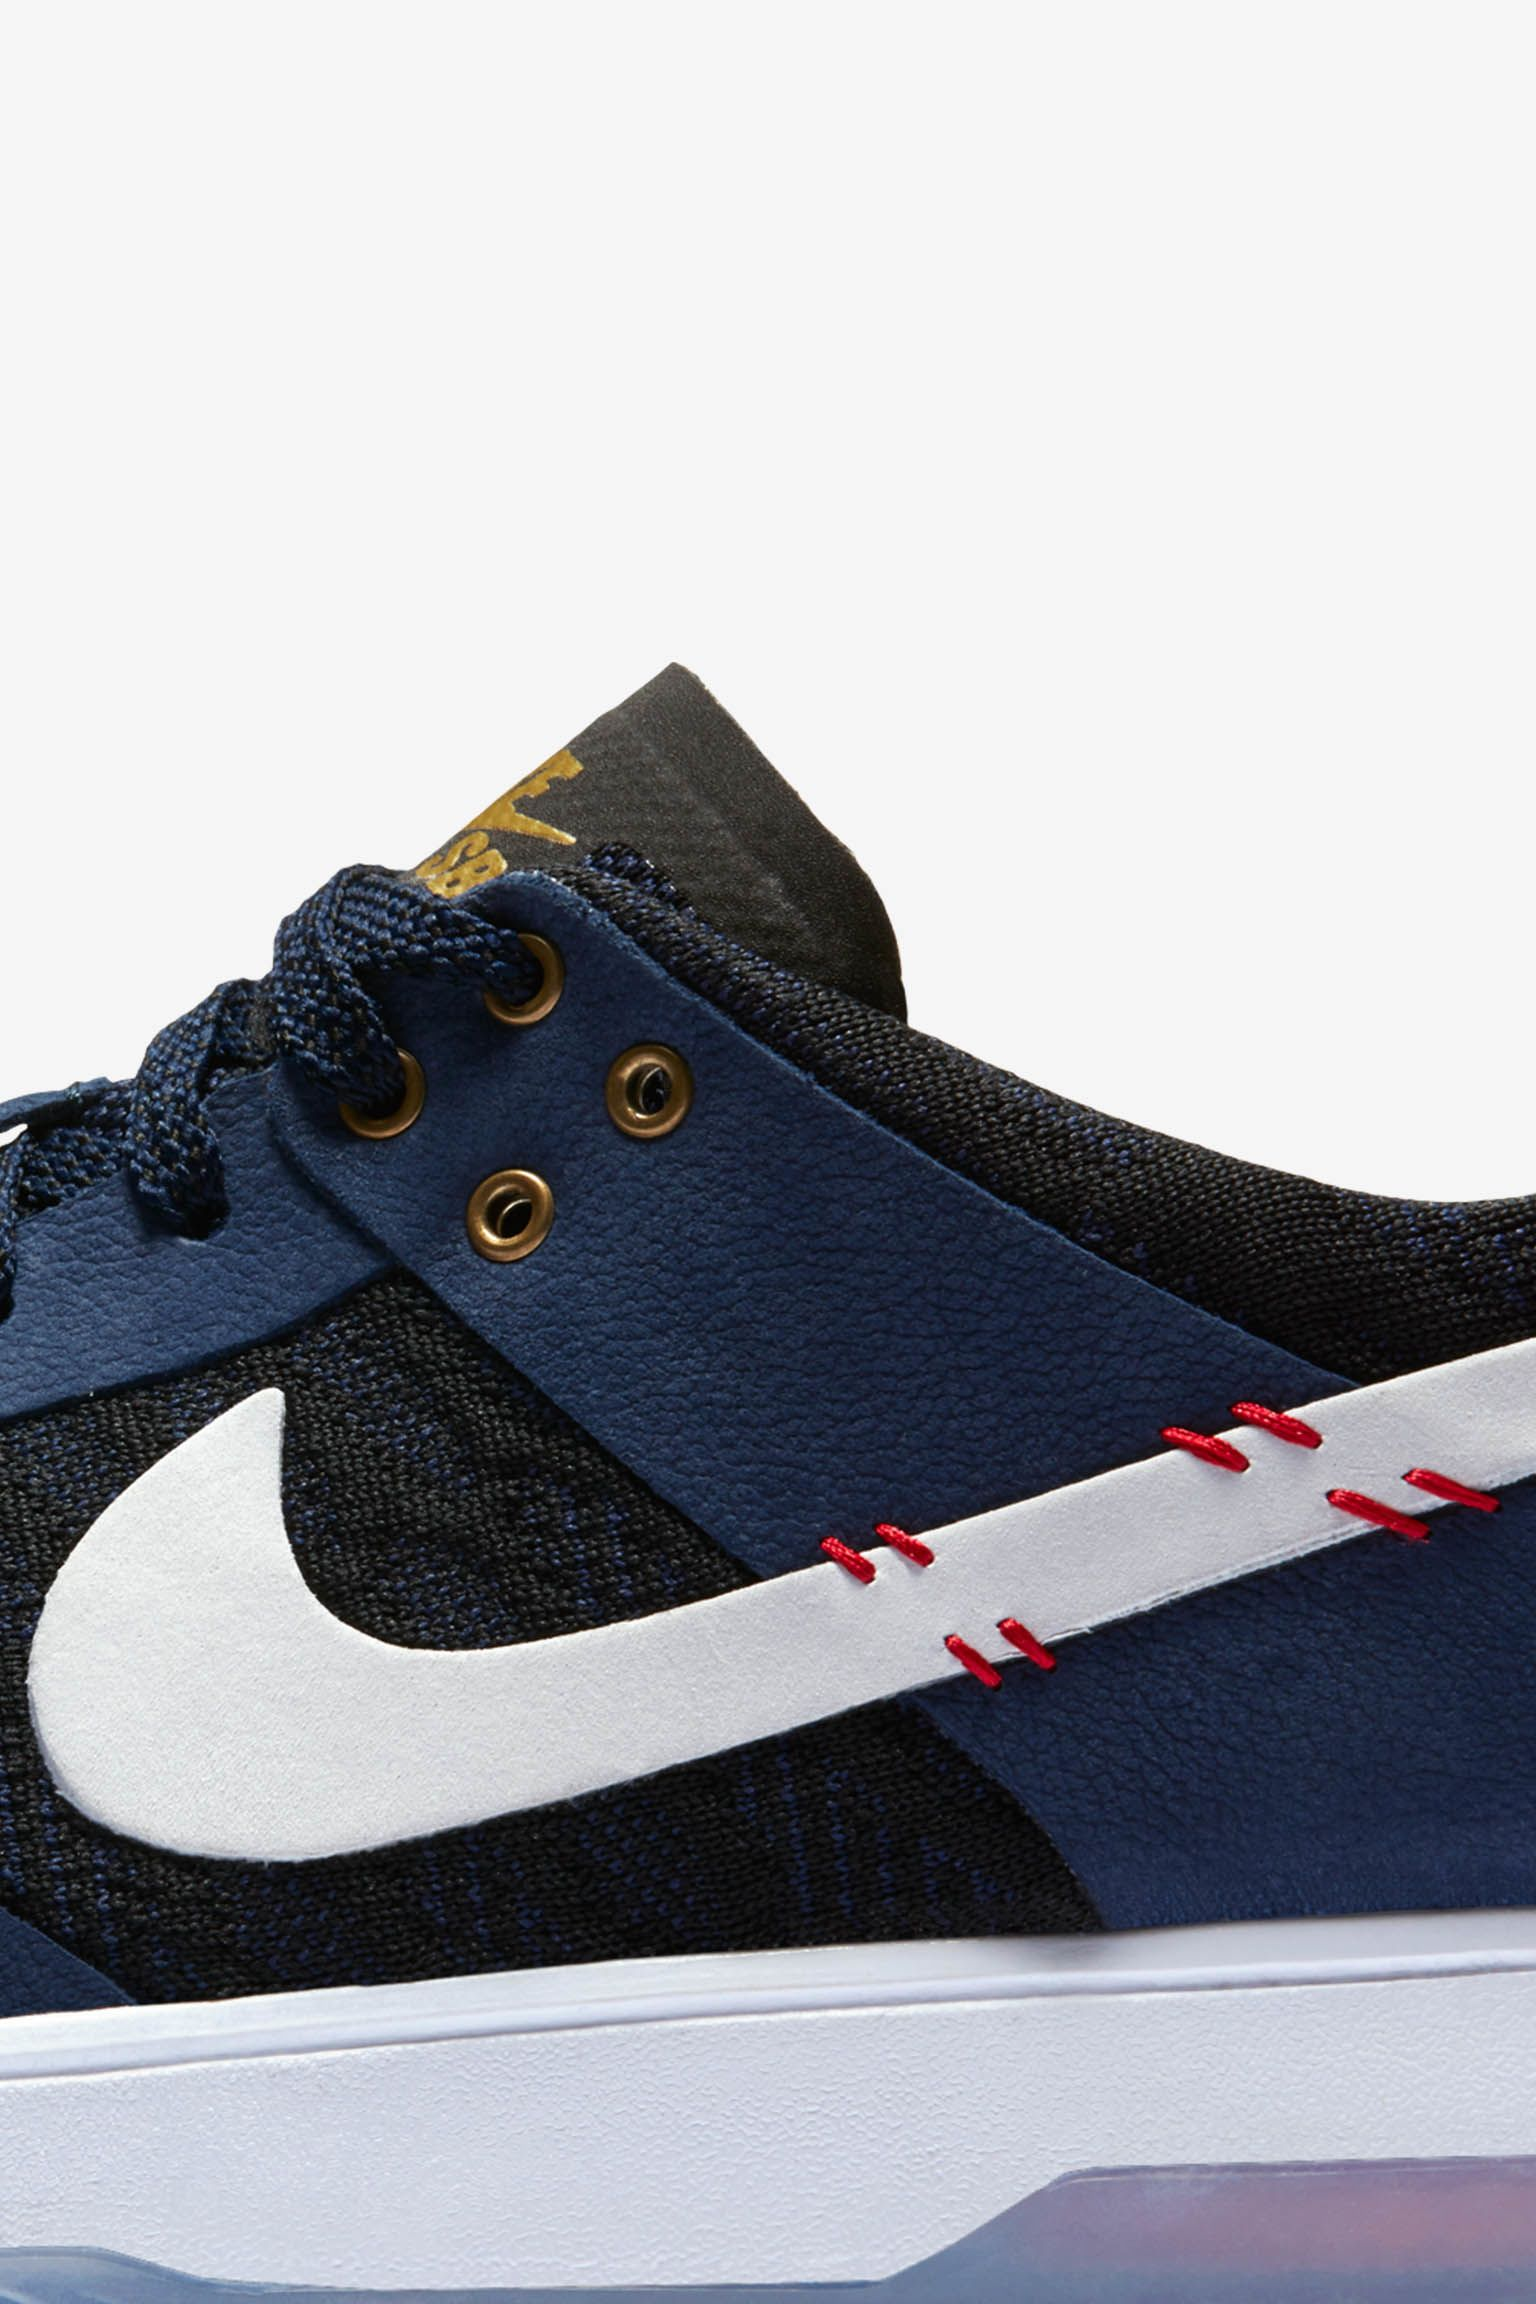 Nike SB Dunk Low Elite 'Sean Malto'